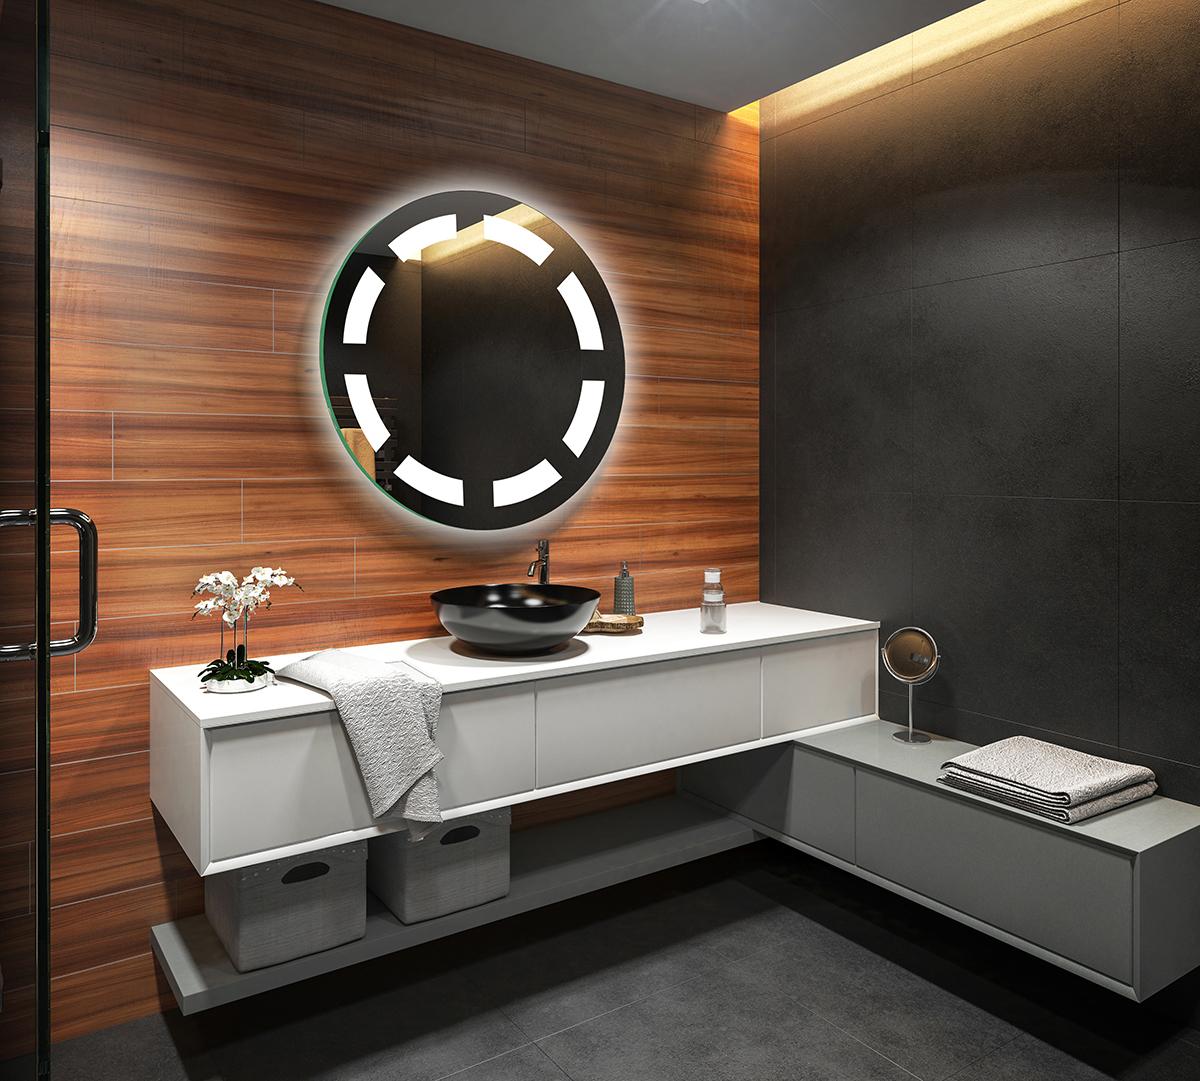 Espejo de ba o moderno e iluminado fabricado a medida con for Espejos de bano con led